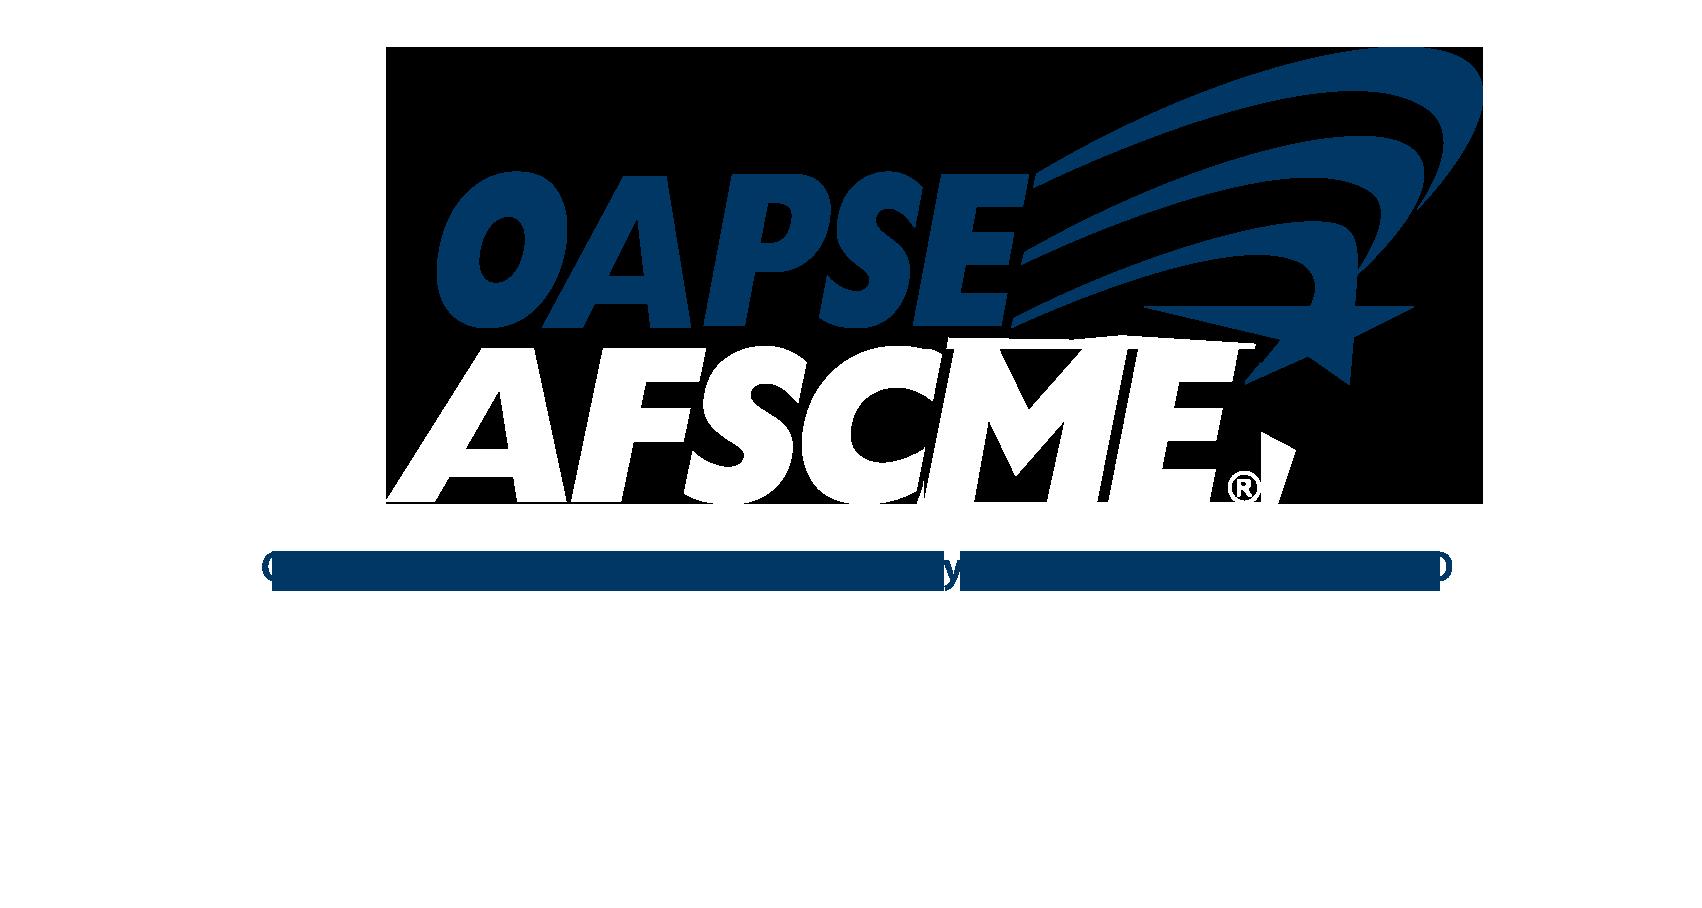 OAPSE – AFSCME